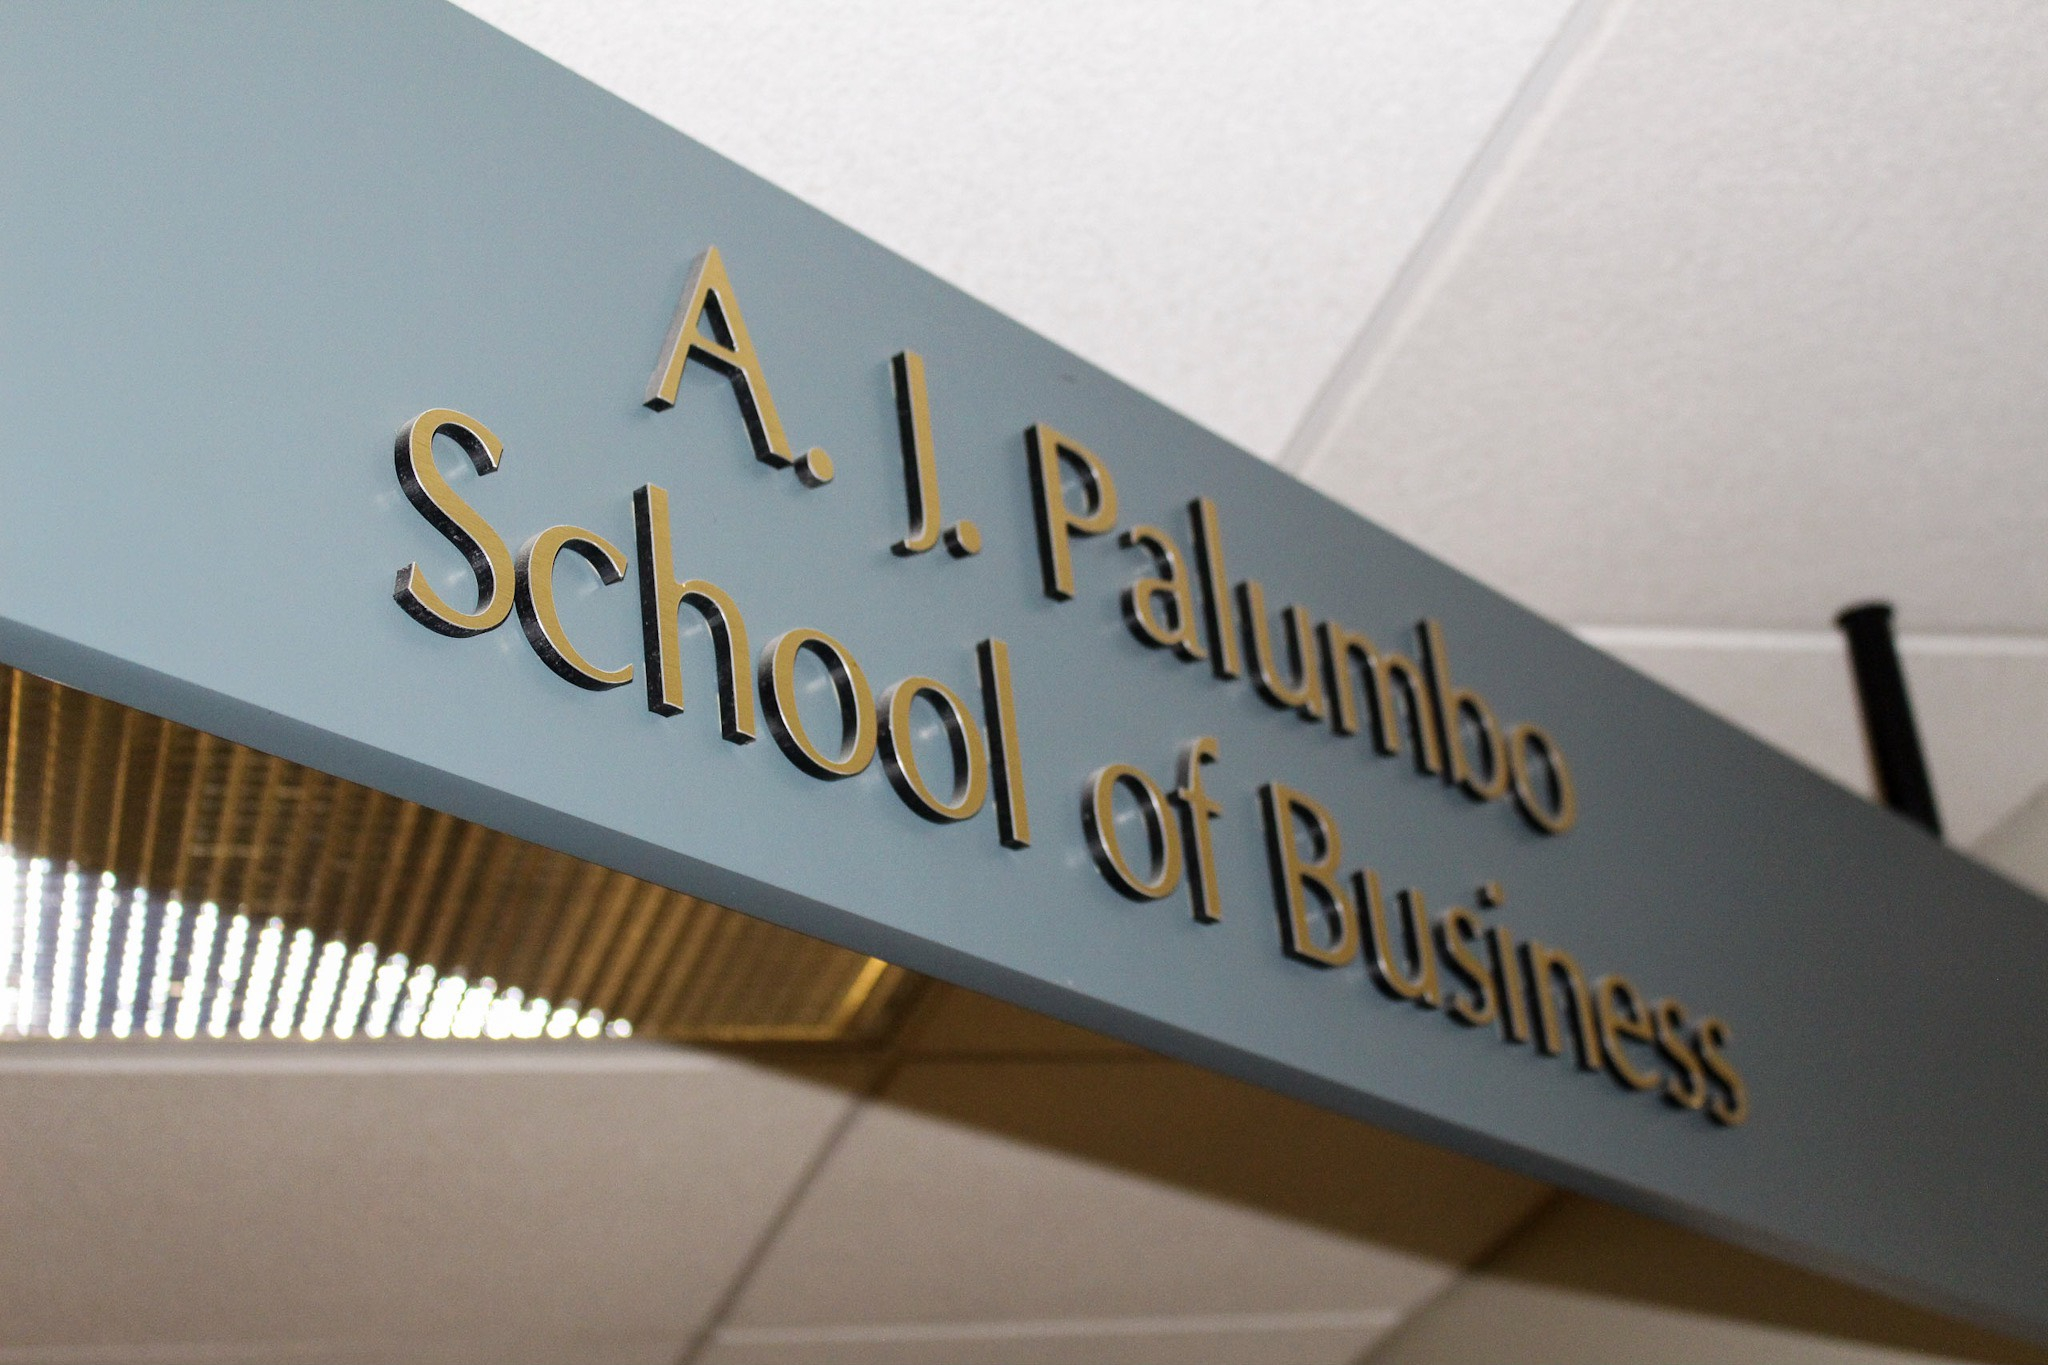 news_businessschool_kaitlynholtz